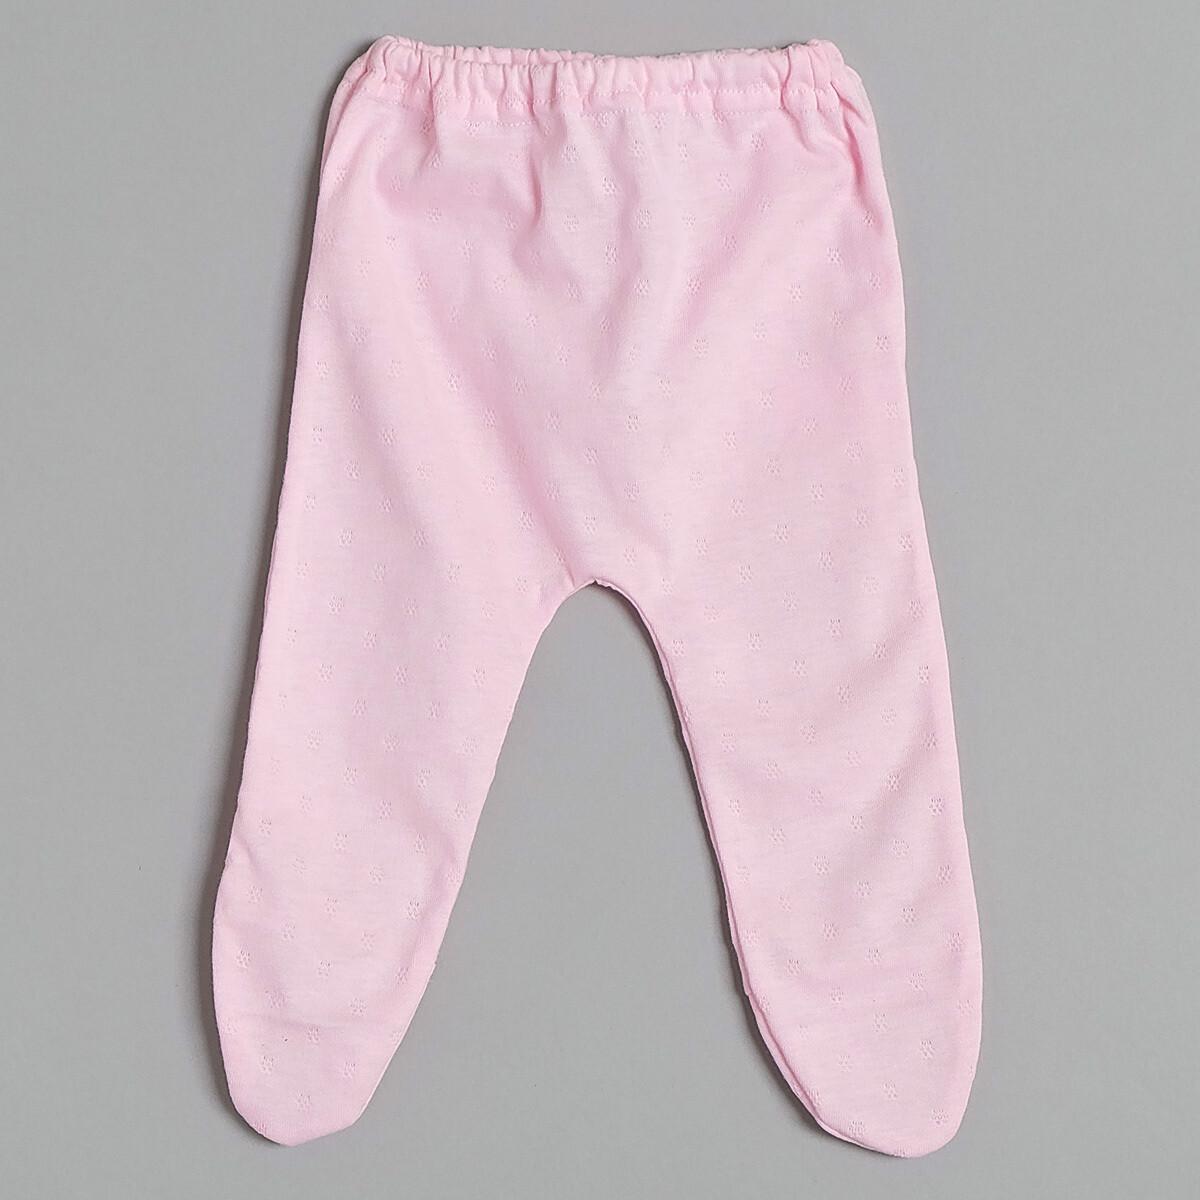 Ползунки на резинке АНТОШКА, летний тонкий трикотаж, розовый